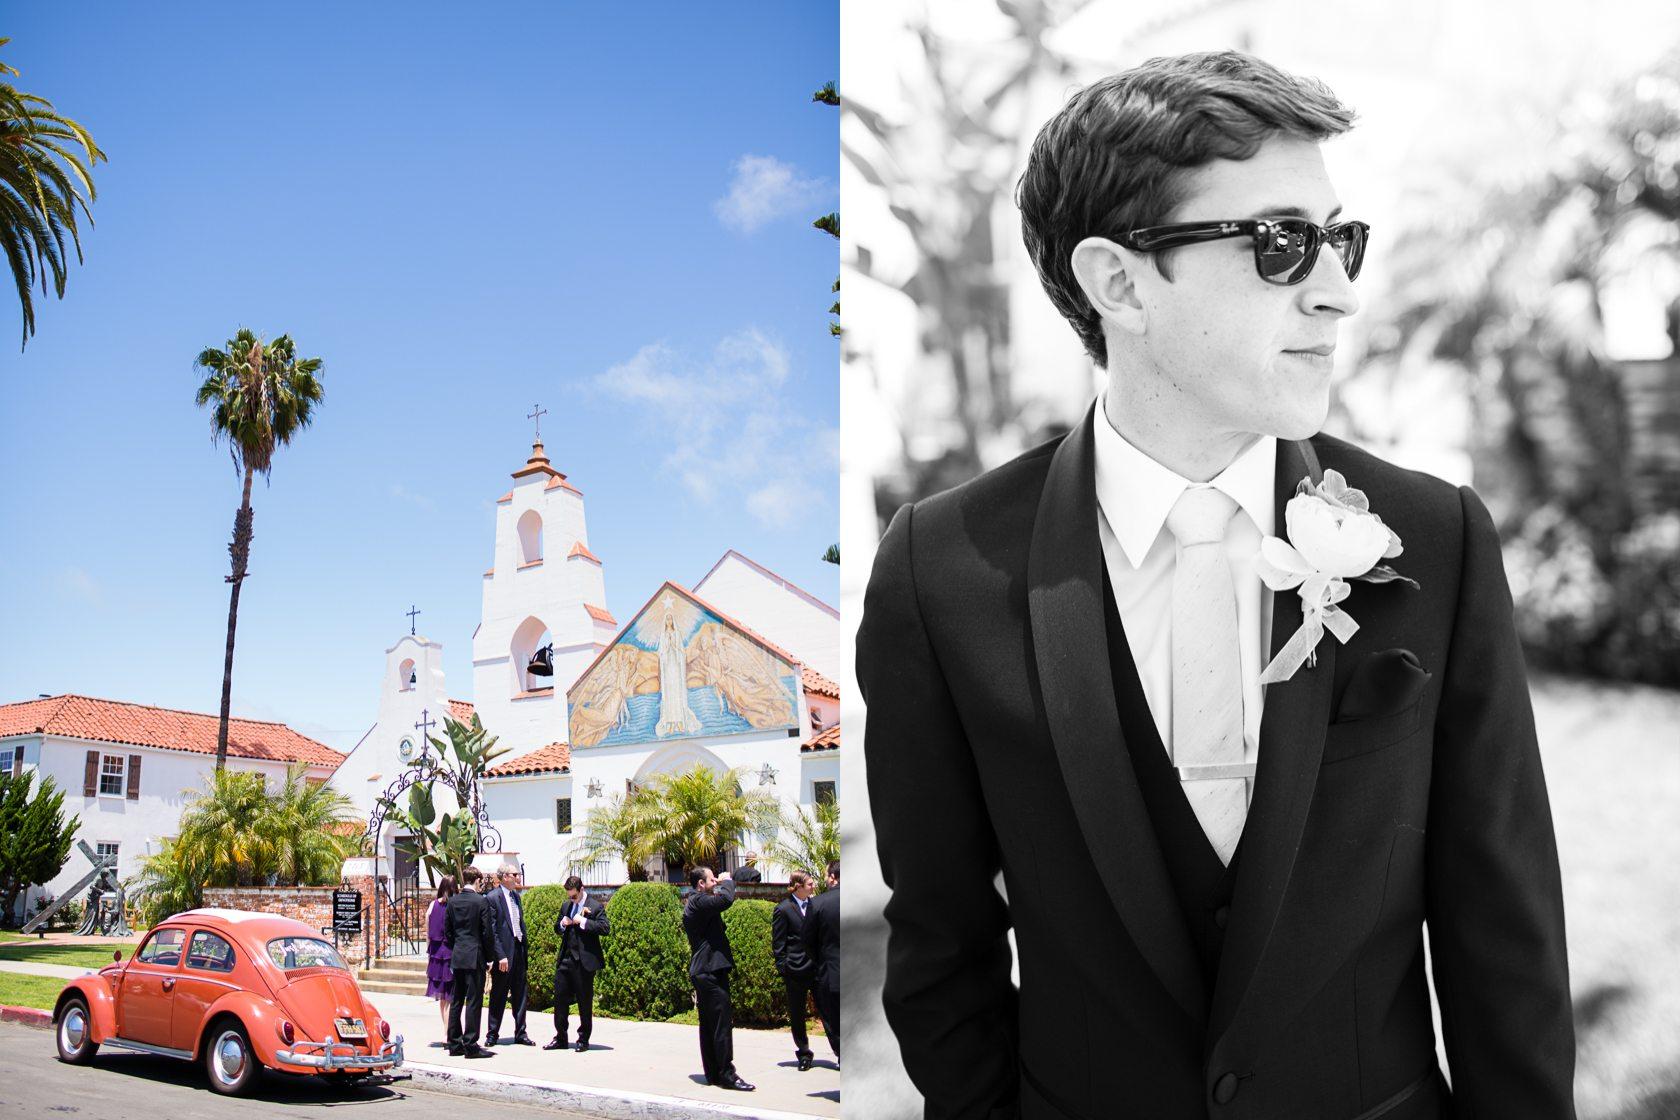 Darlington_House_Wedding_049.jpg